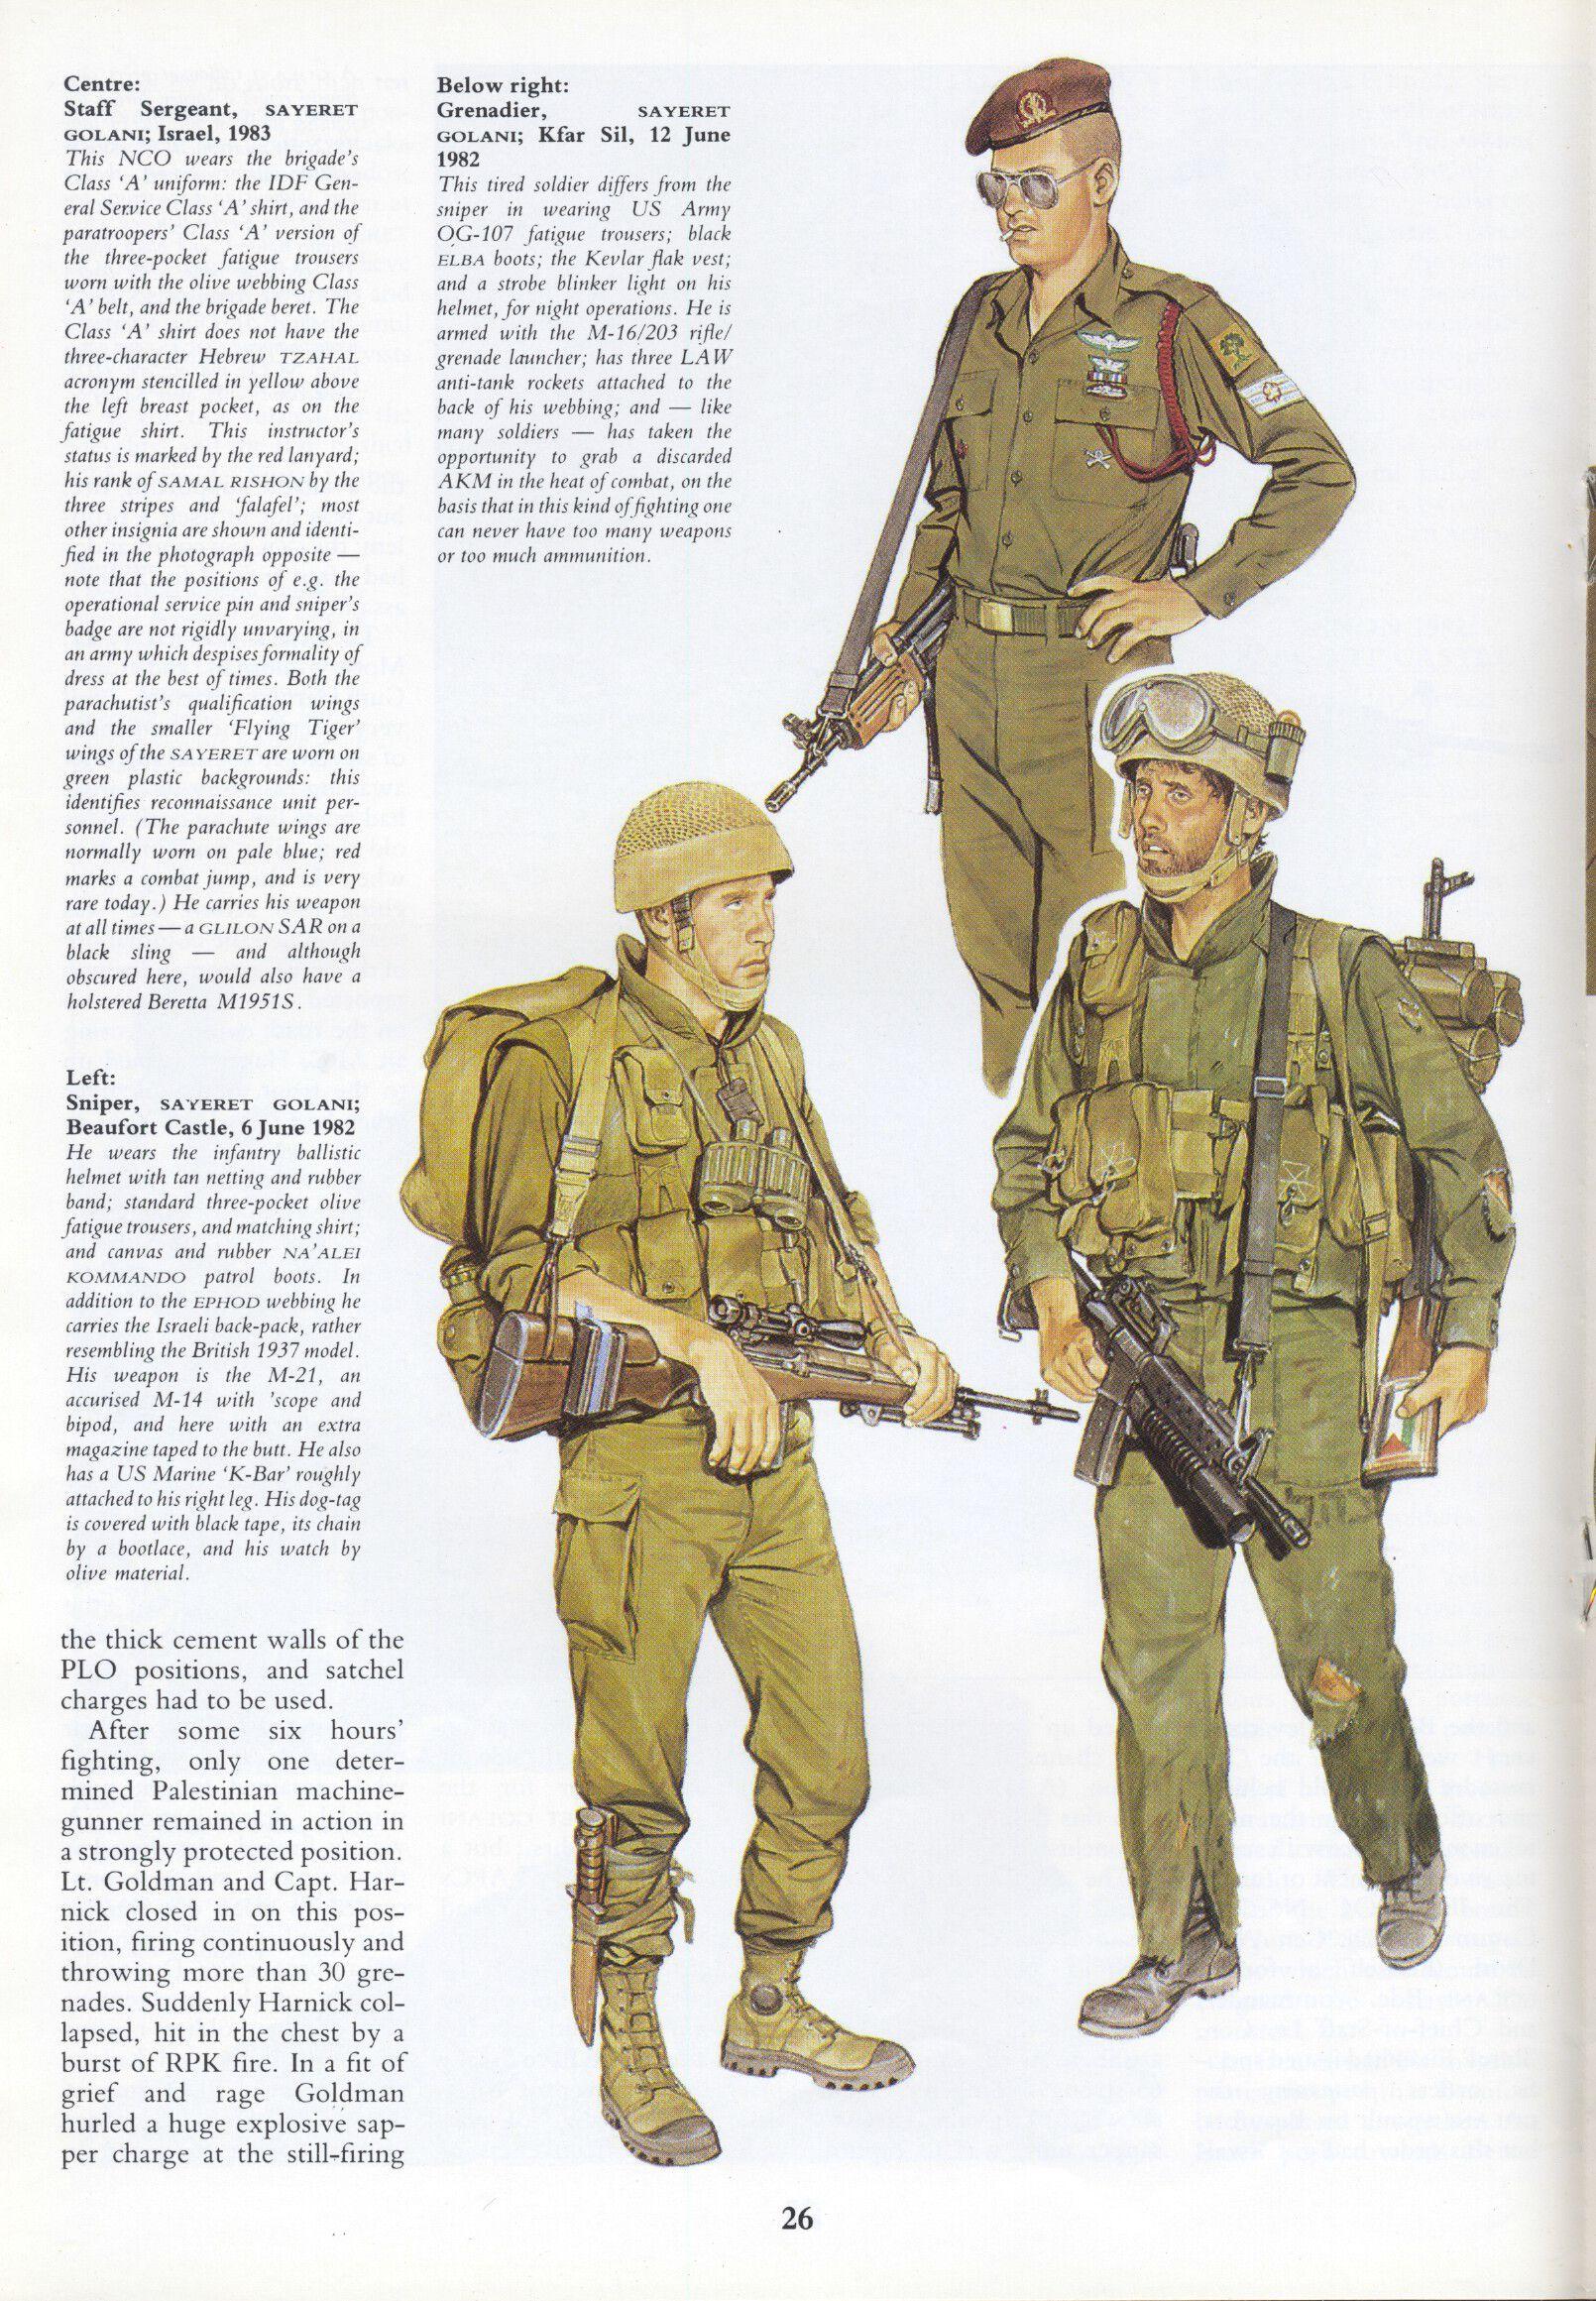 MilitaryIllustrated 1987-02-03 (05)1.jpg